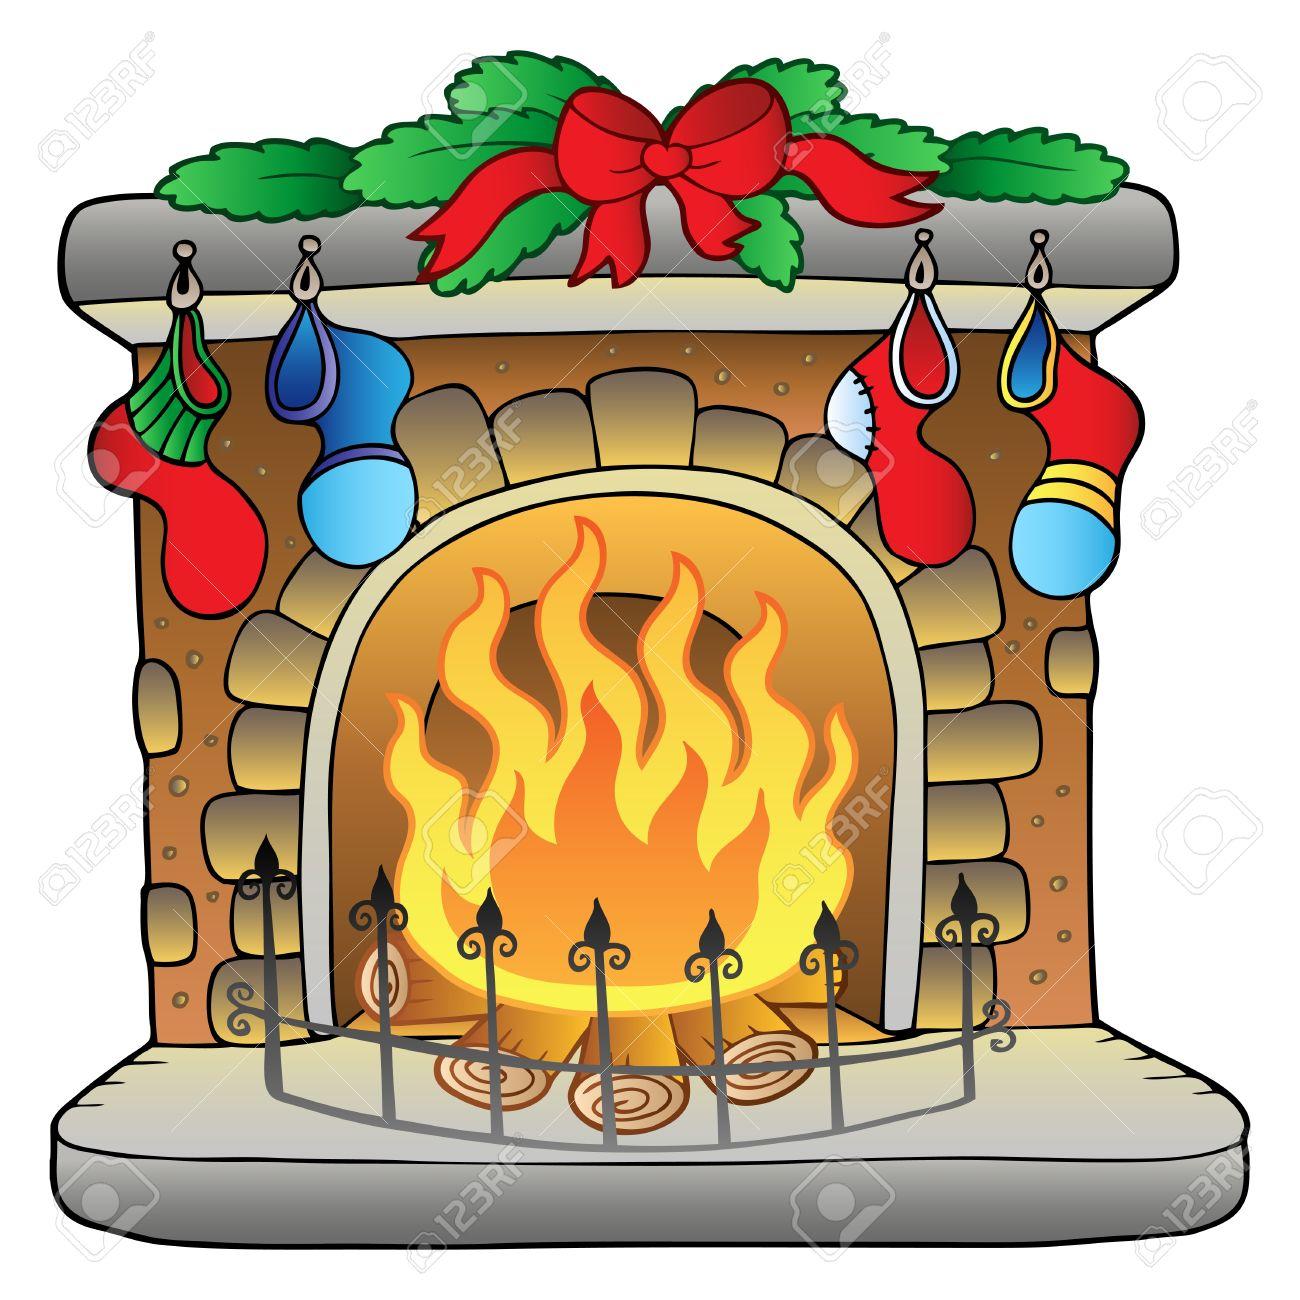 christmas cartoon fireplace royalty free cliparts vectors and rh 123rf com christmas stocking fireplace clipart christmas fireplace clipart free